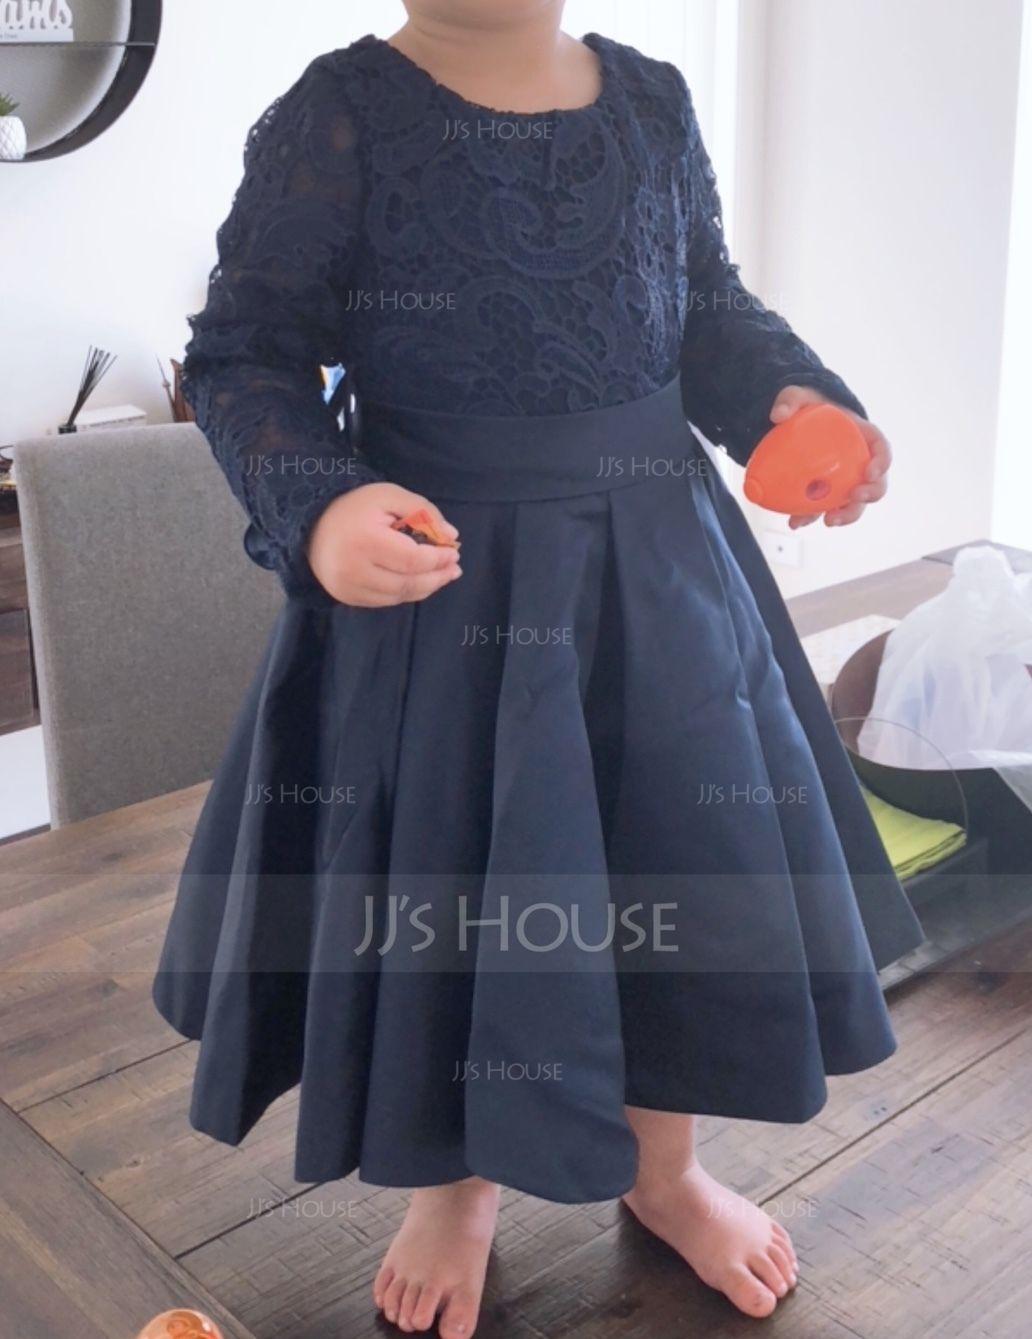 A-Line/Princess Scoop Neck Knee-Length Satin Junior Bridesmaid Dress With Sash Bow(s) (009136426)